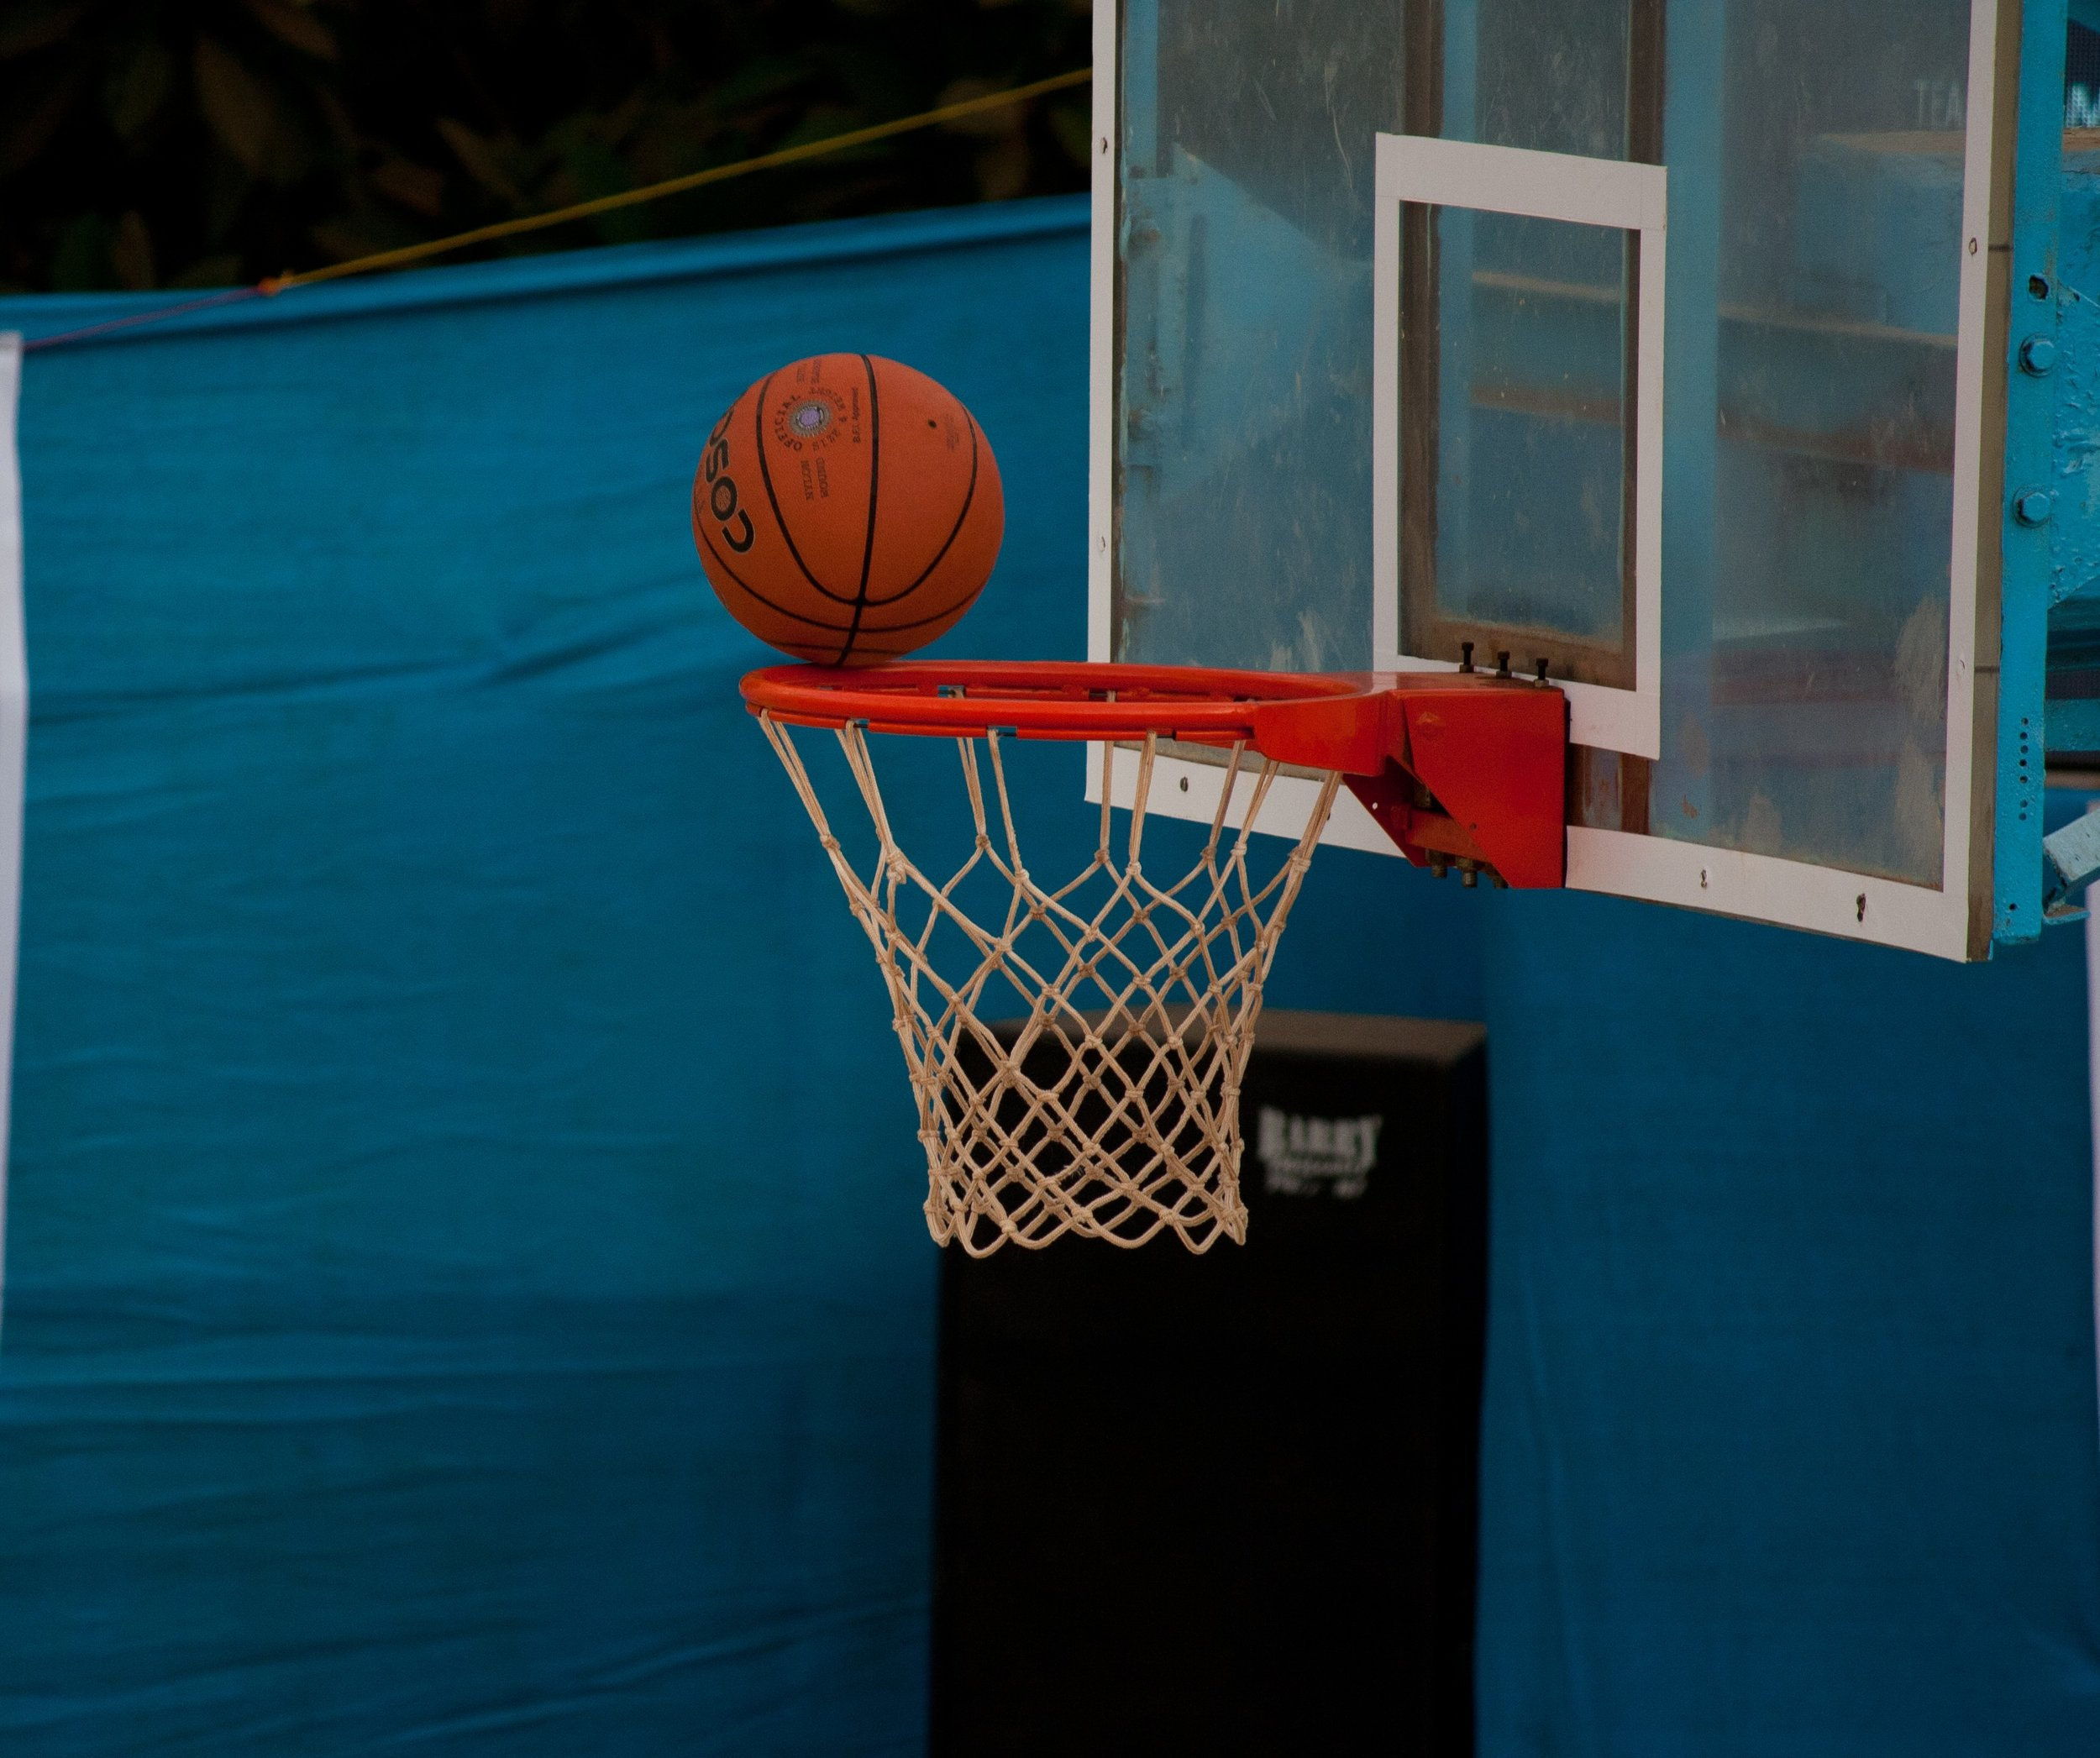 basketball-166964.jpg